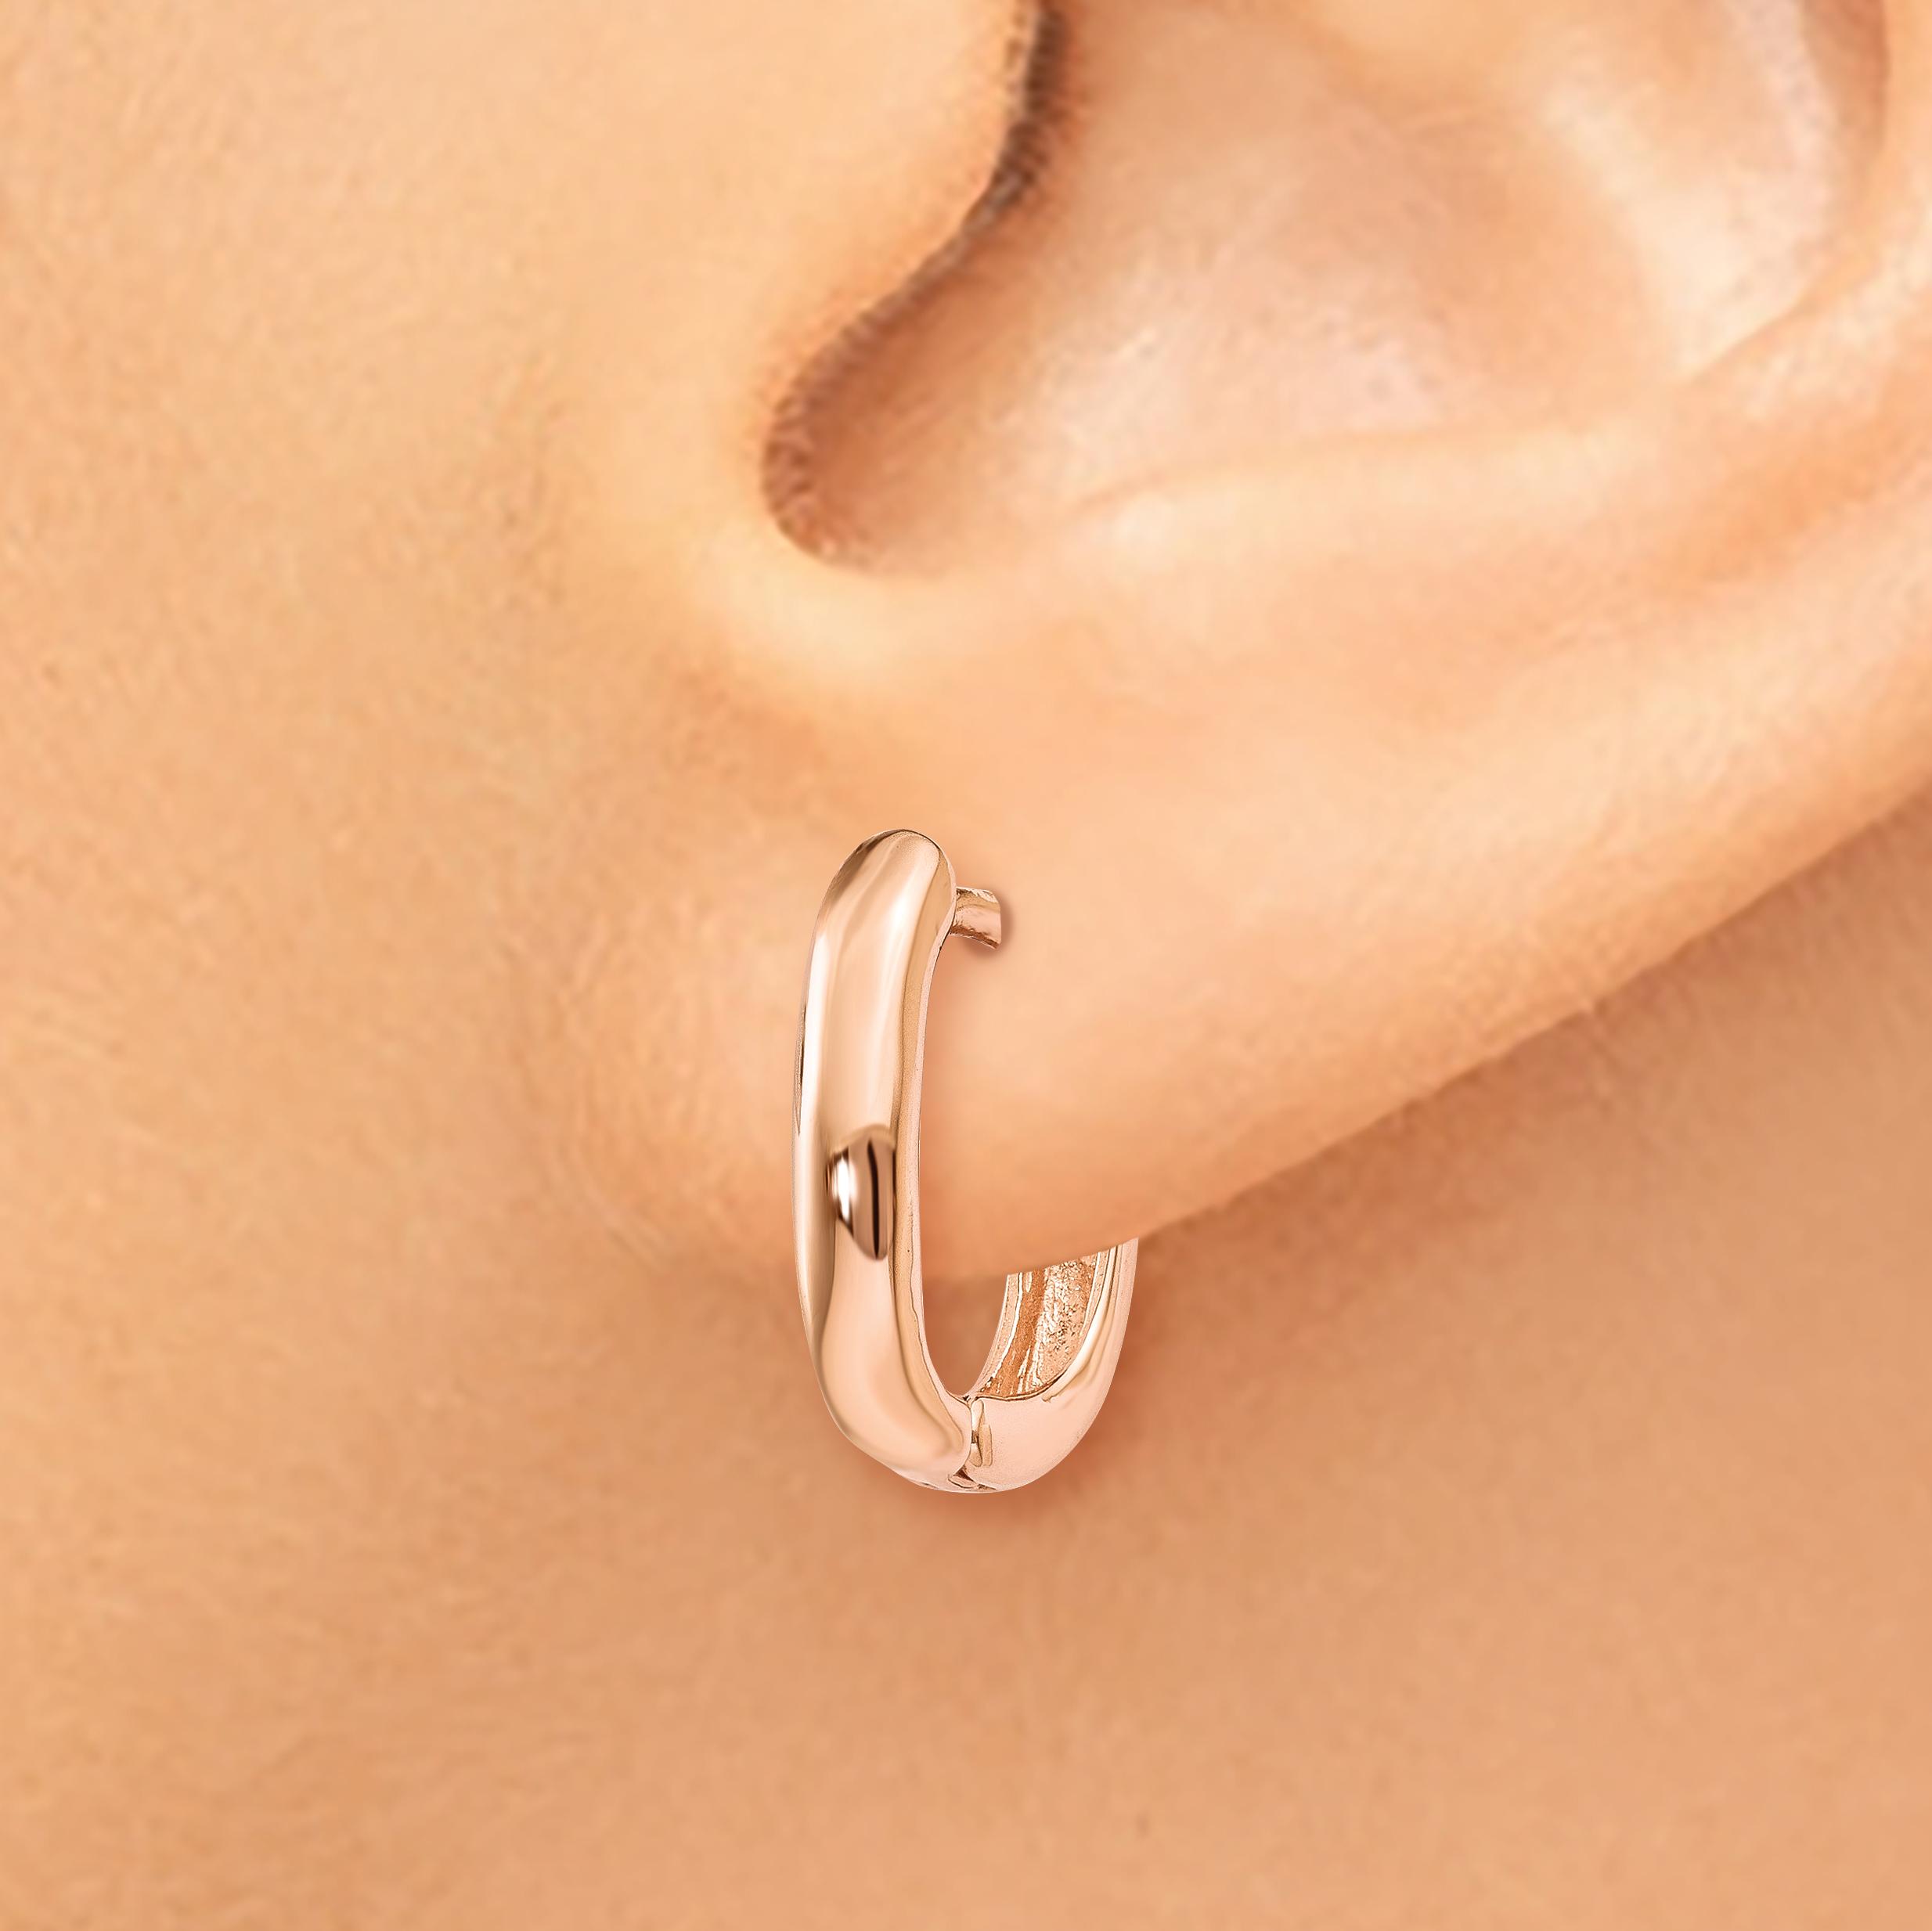 14k Rose Gold Oval Hinged Hoop Earrings Ear Hoops Set Fine Jewelry Gifts For Women For Her - image 3 de 4